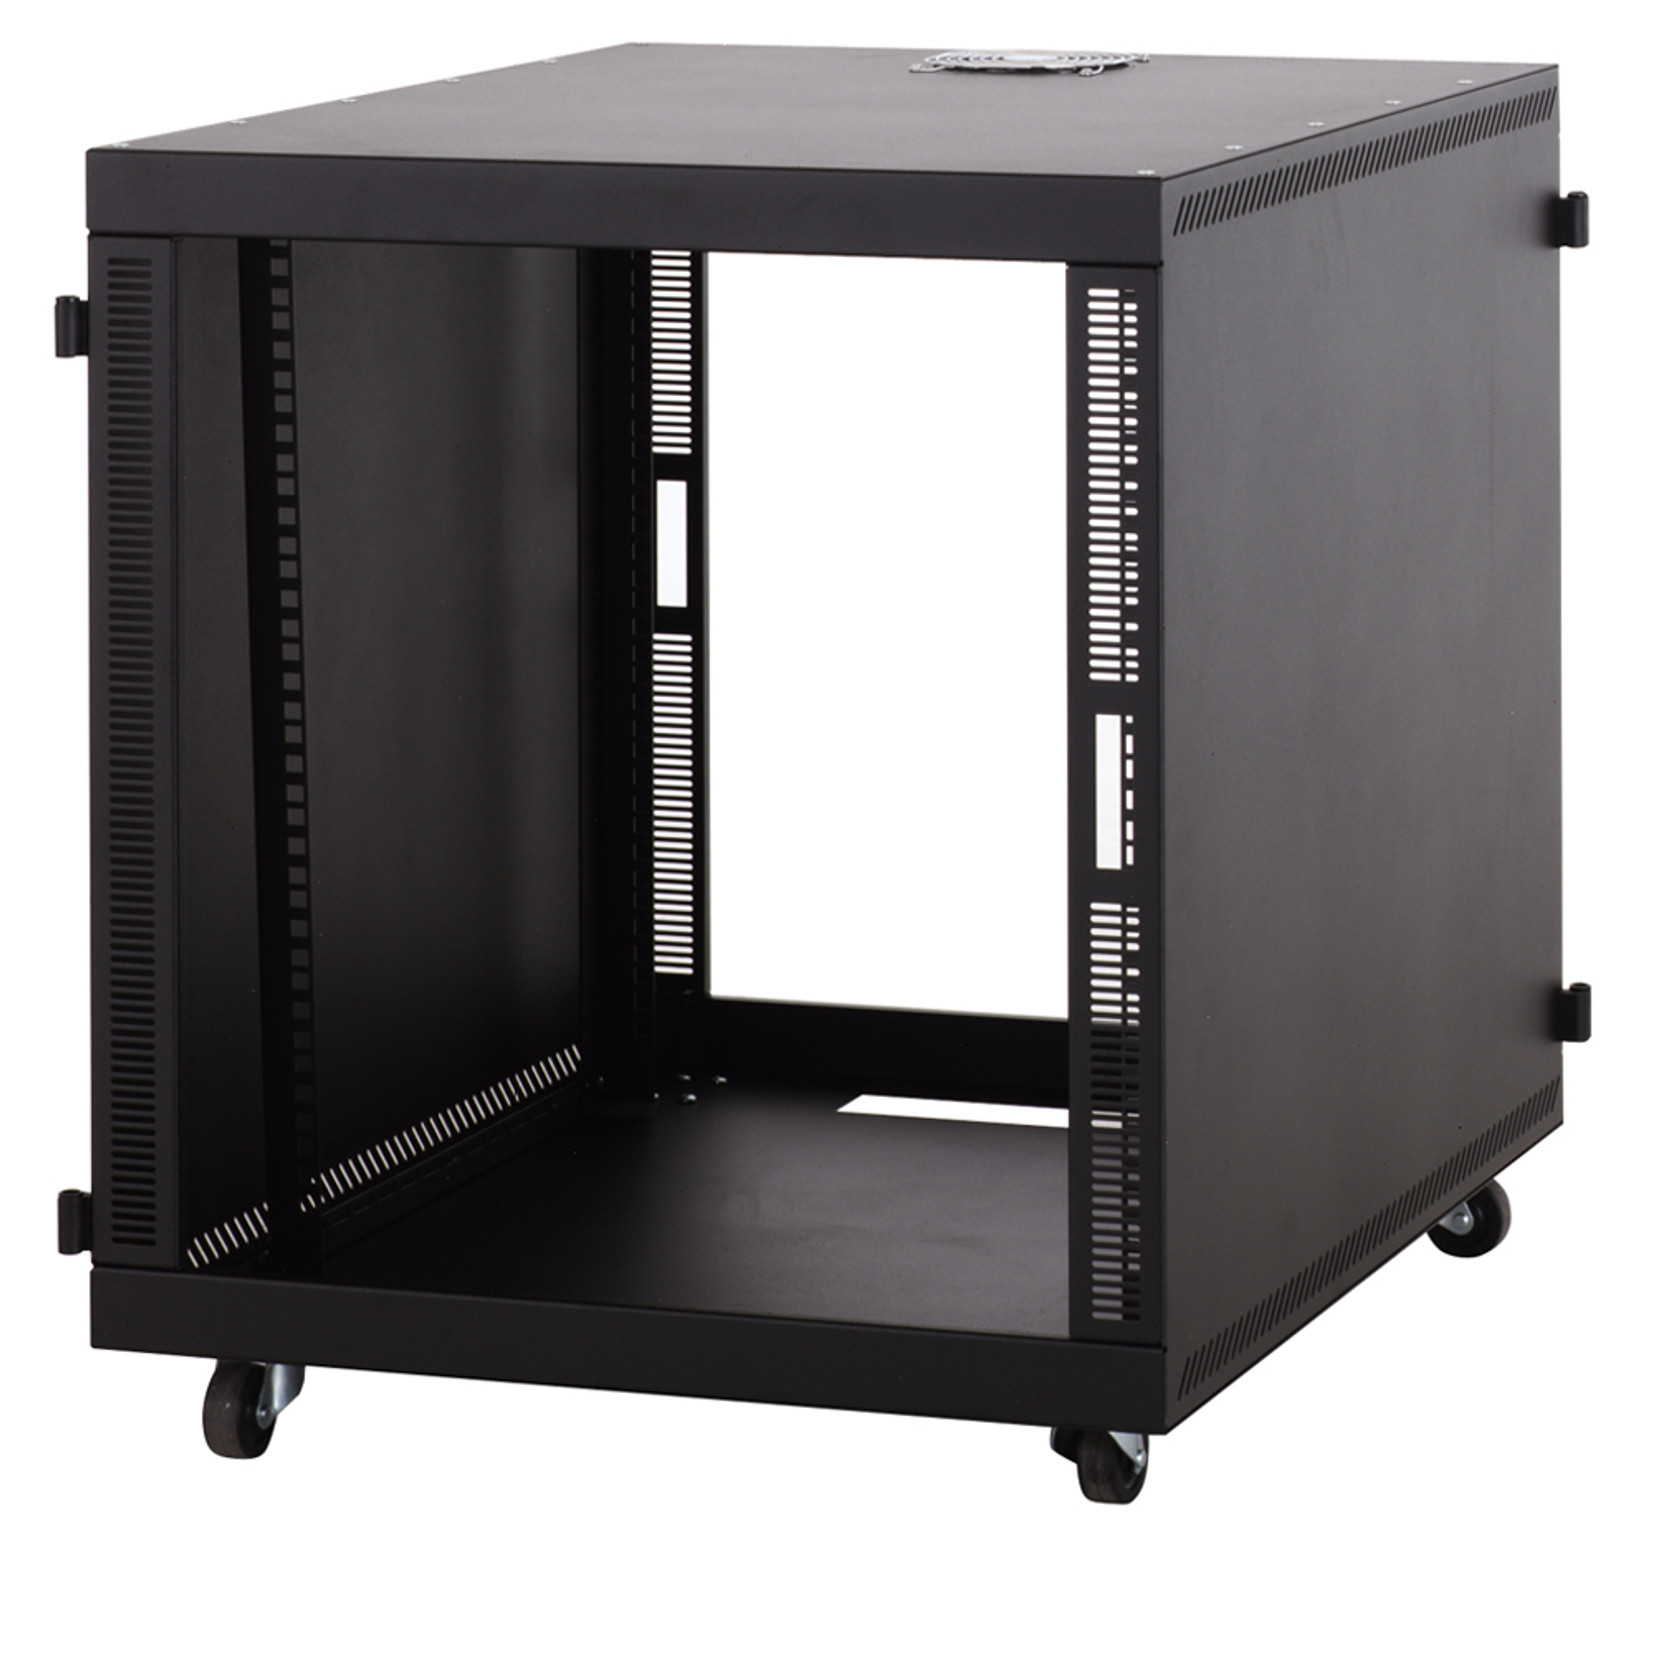 Kendall Howard 174 Compact Series Soho Server Cabinets